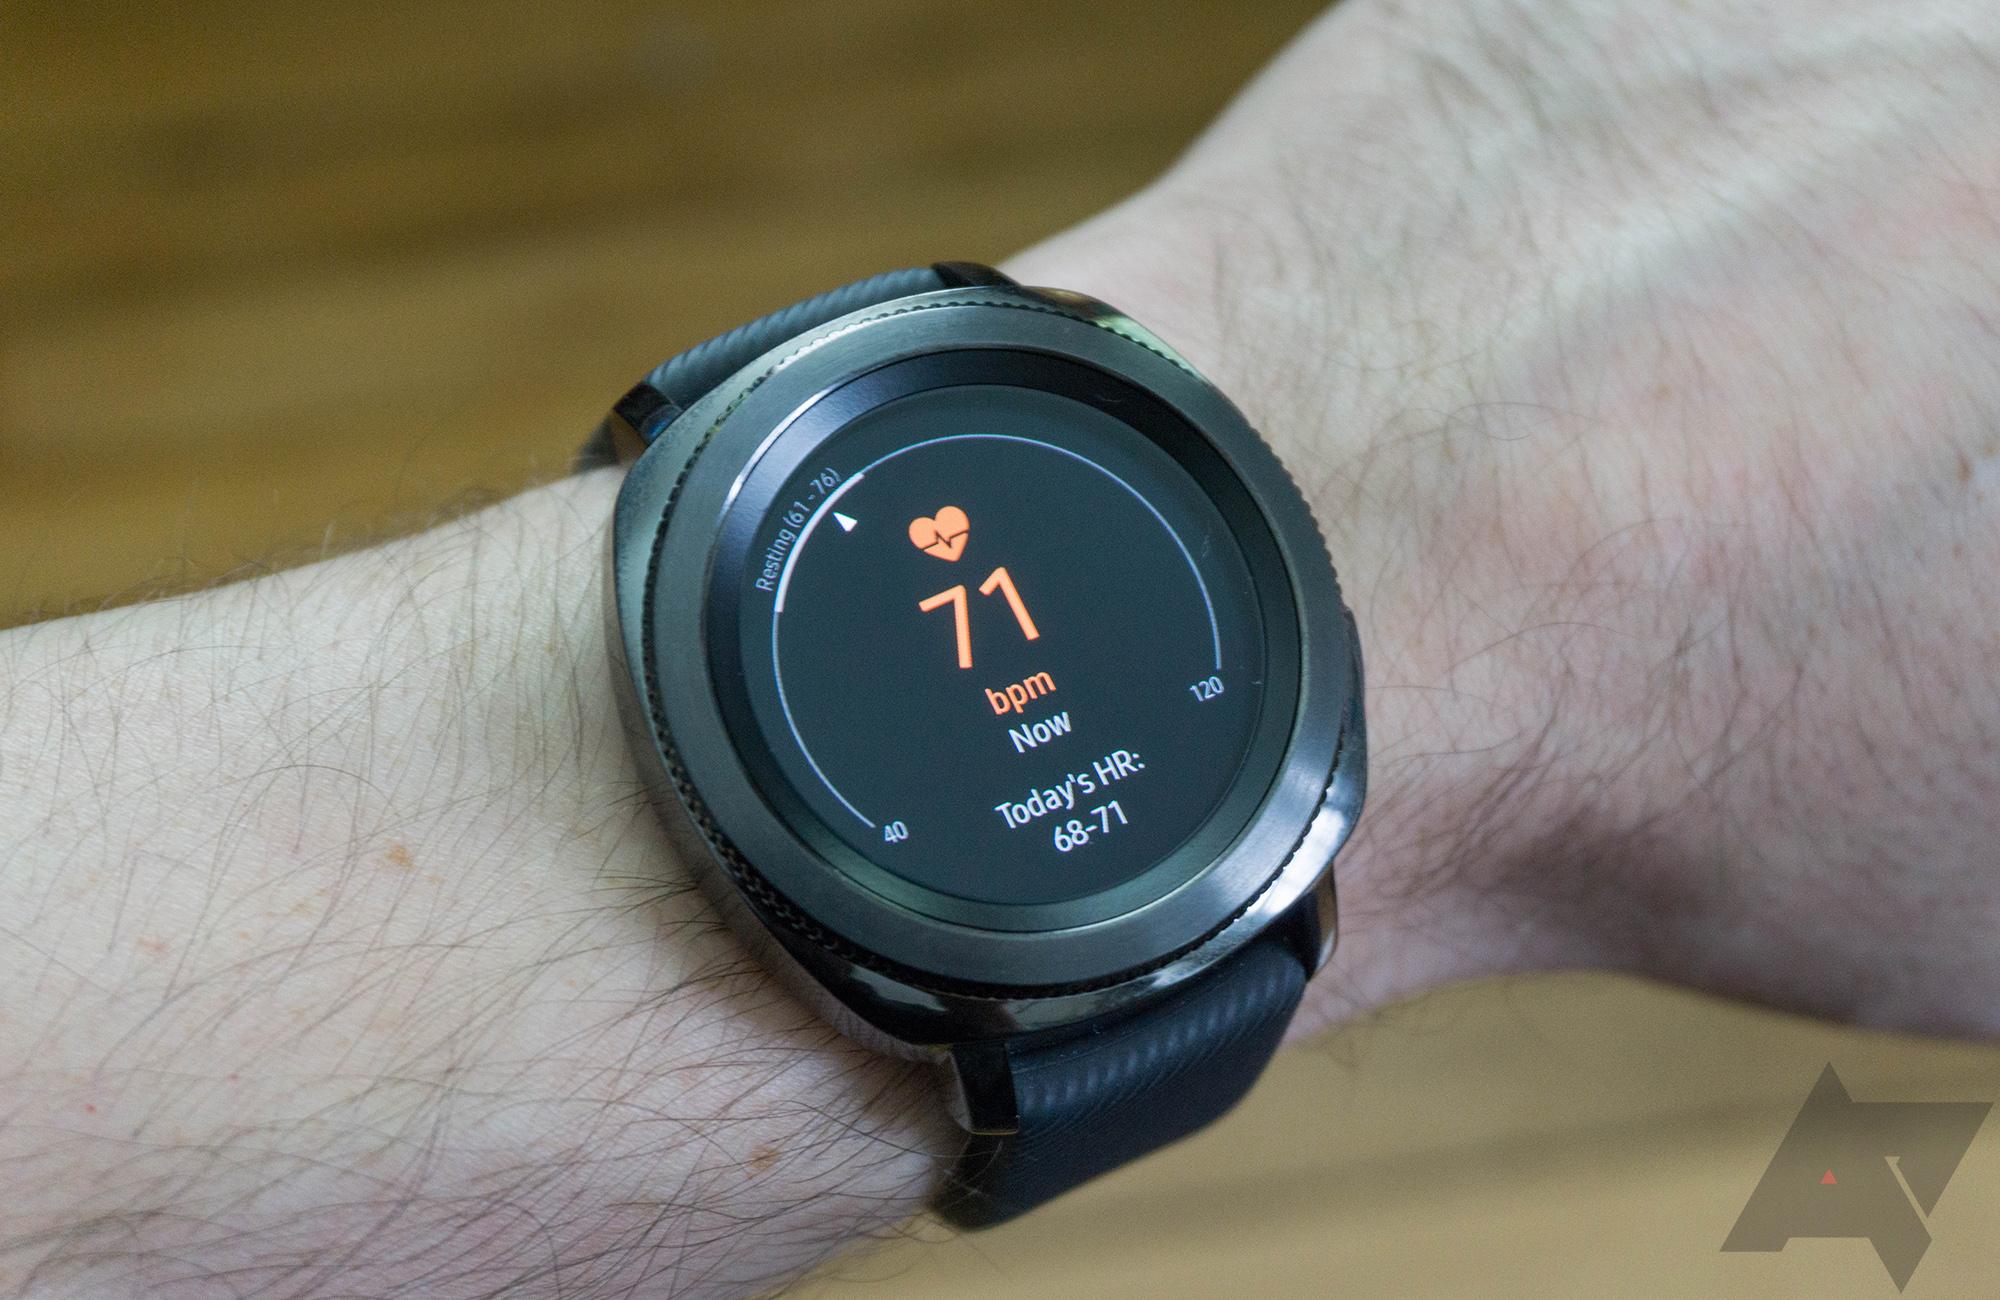 Samsung Gear Sport review: A smartwatch regular people might